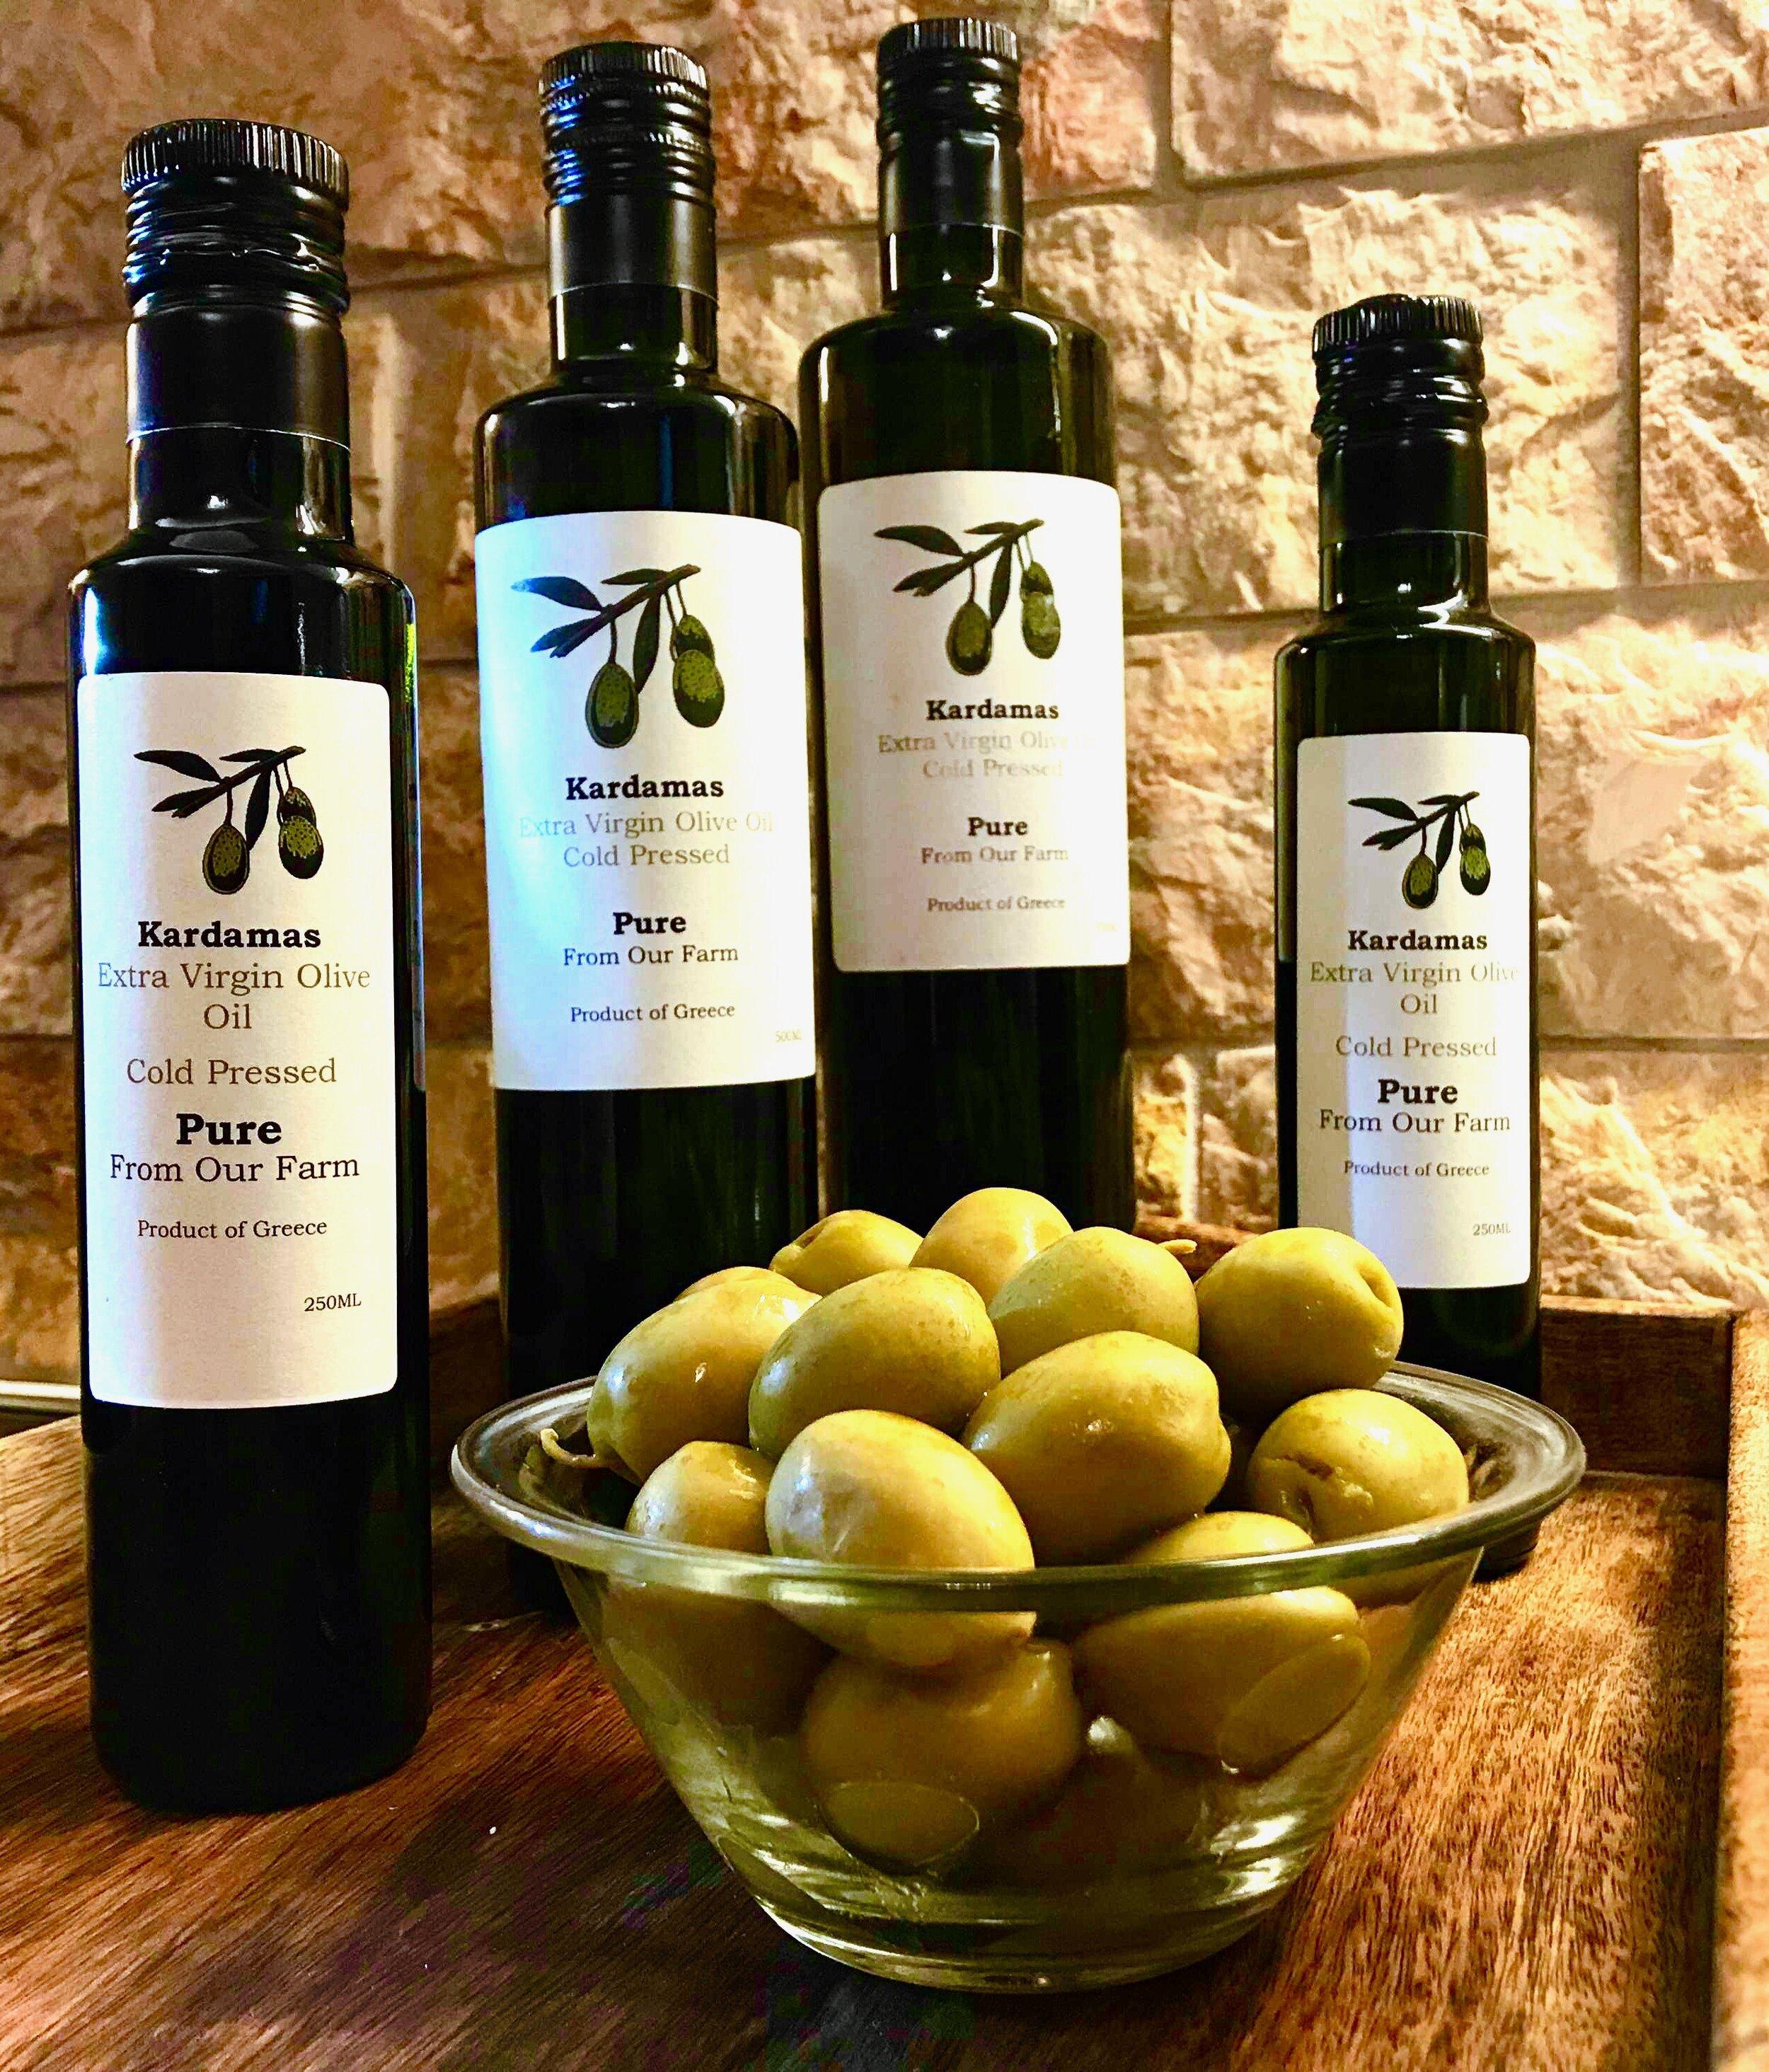 Kardamas extra virgin olive oil